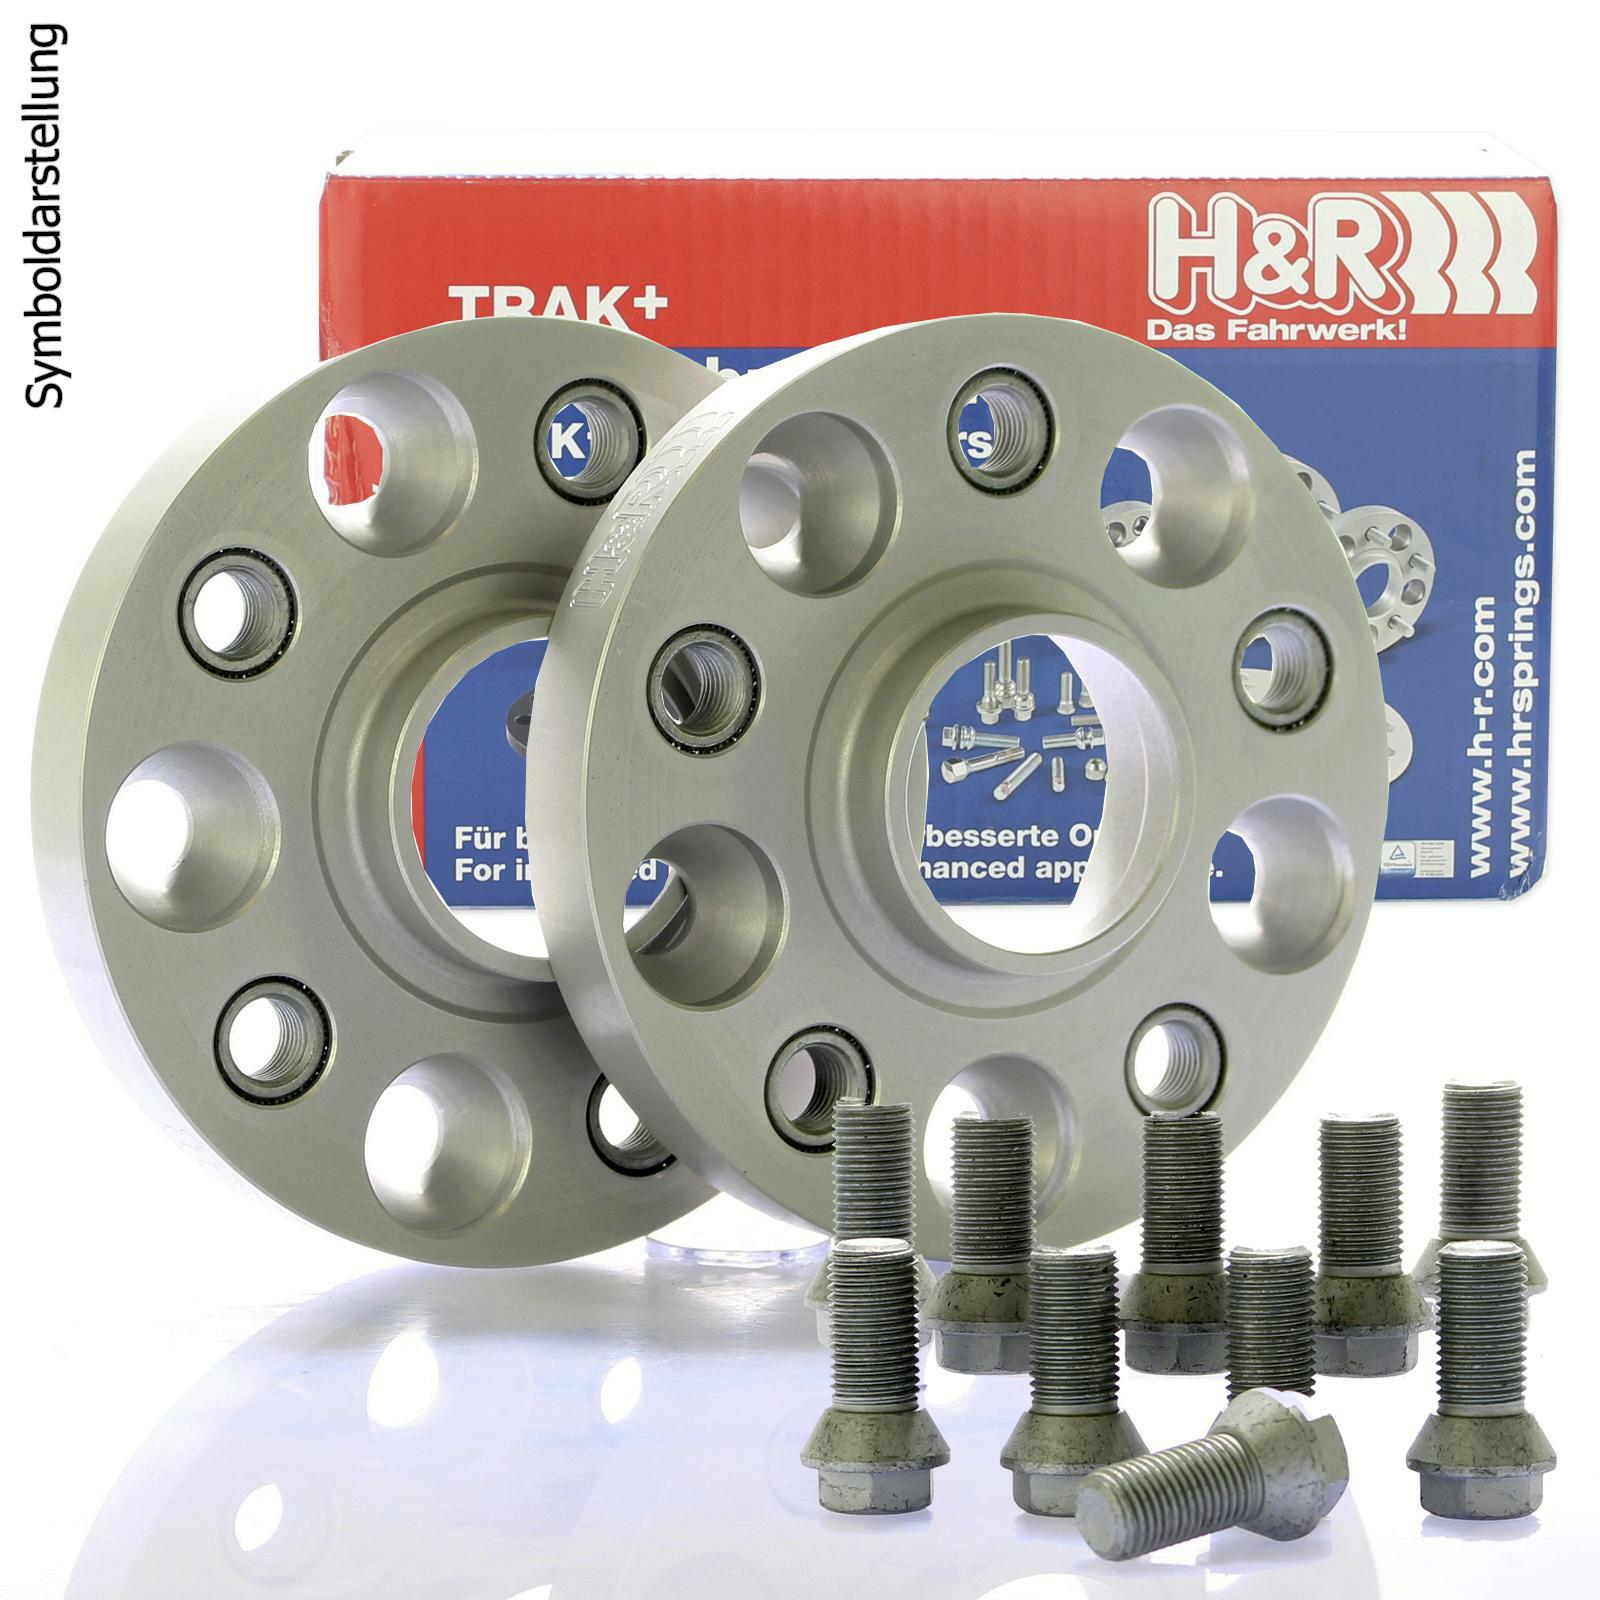 H&R DRA Spurplatten Spurverbreiterung Distanzscheibe 5x120 50mm // 2x25mm